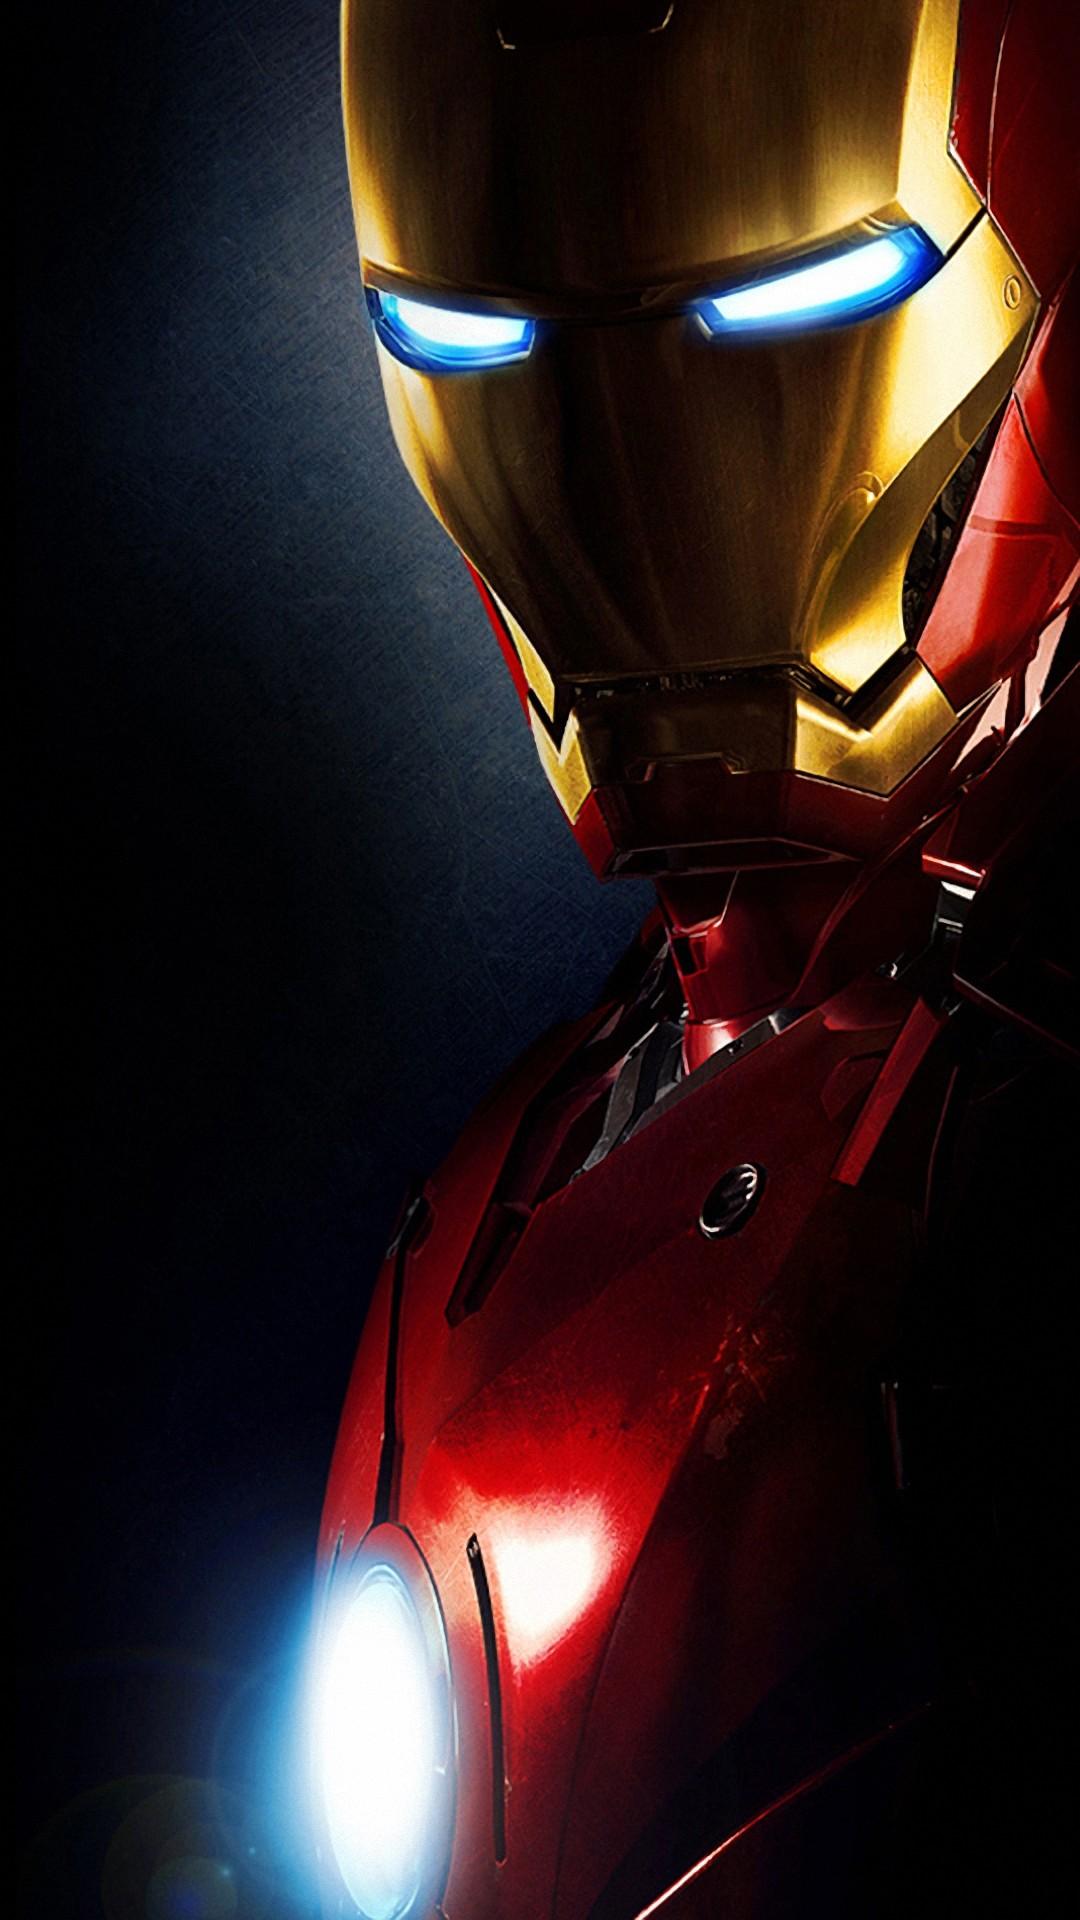 Iron man jarvis wallpaper hd 72 images - Iron man wallpaper 4k ...